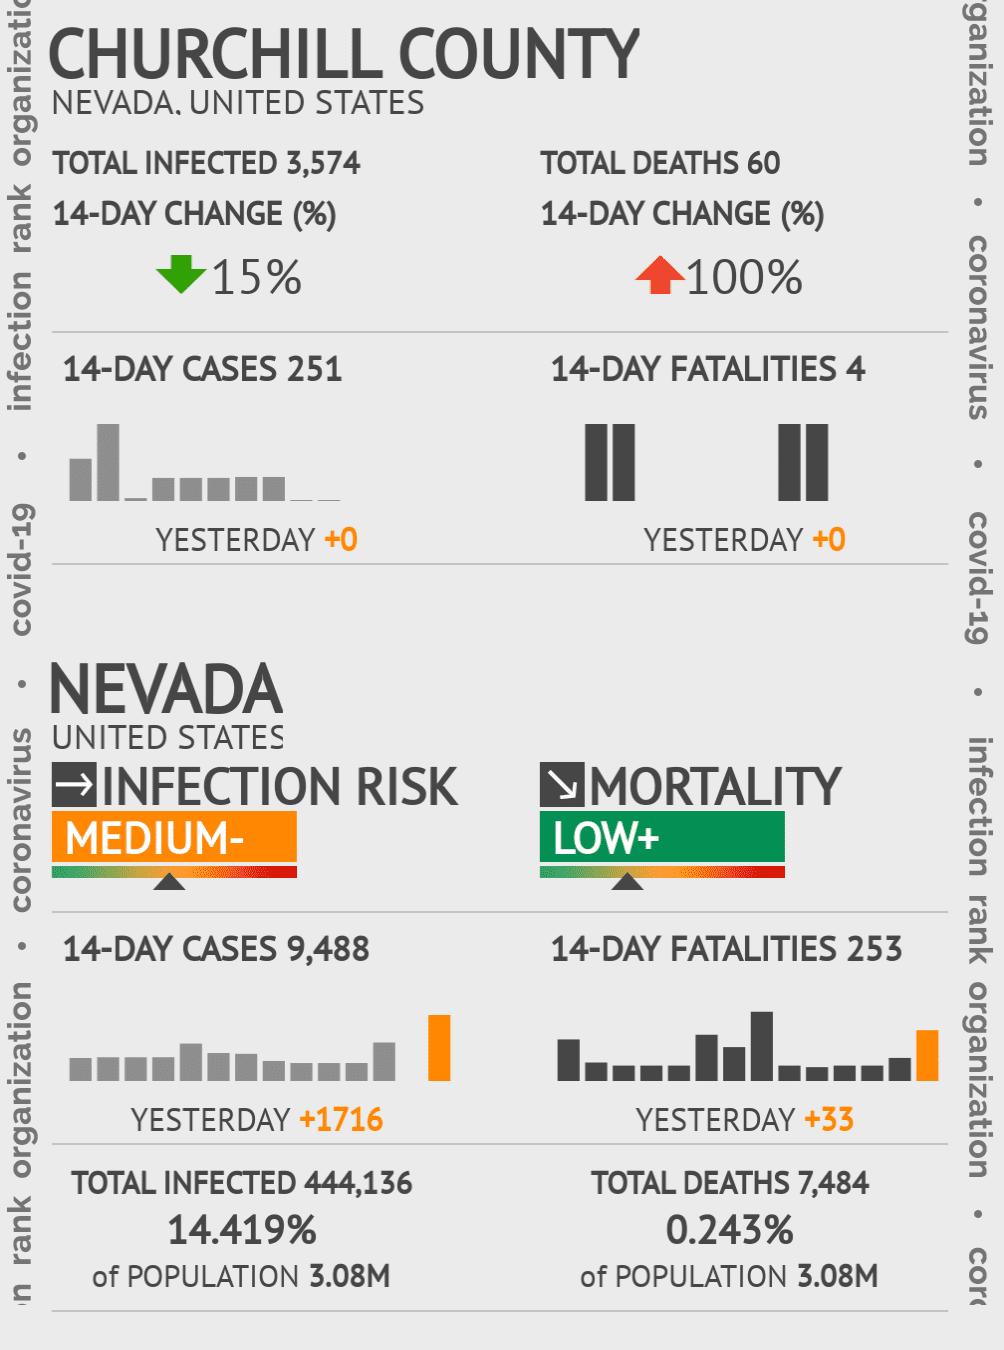 Churchill County Coronavirus Covid-19 Risk of Infection on July 24, 2021